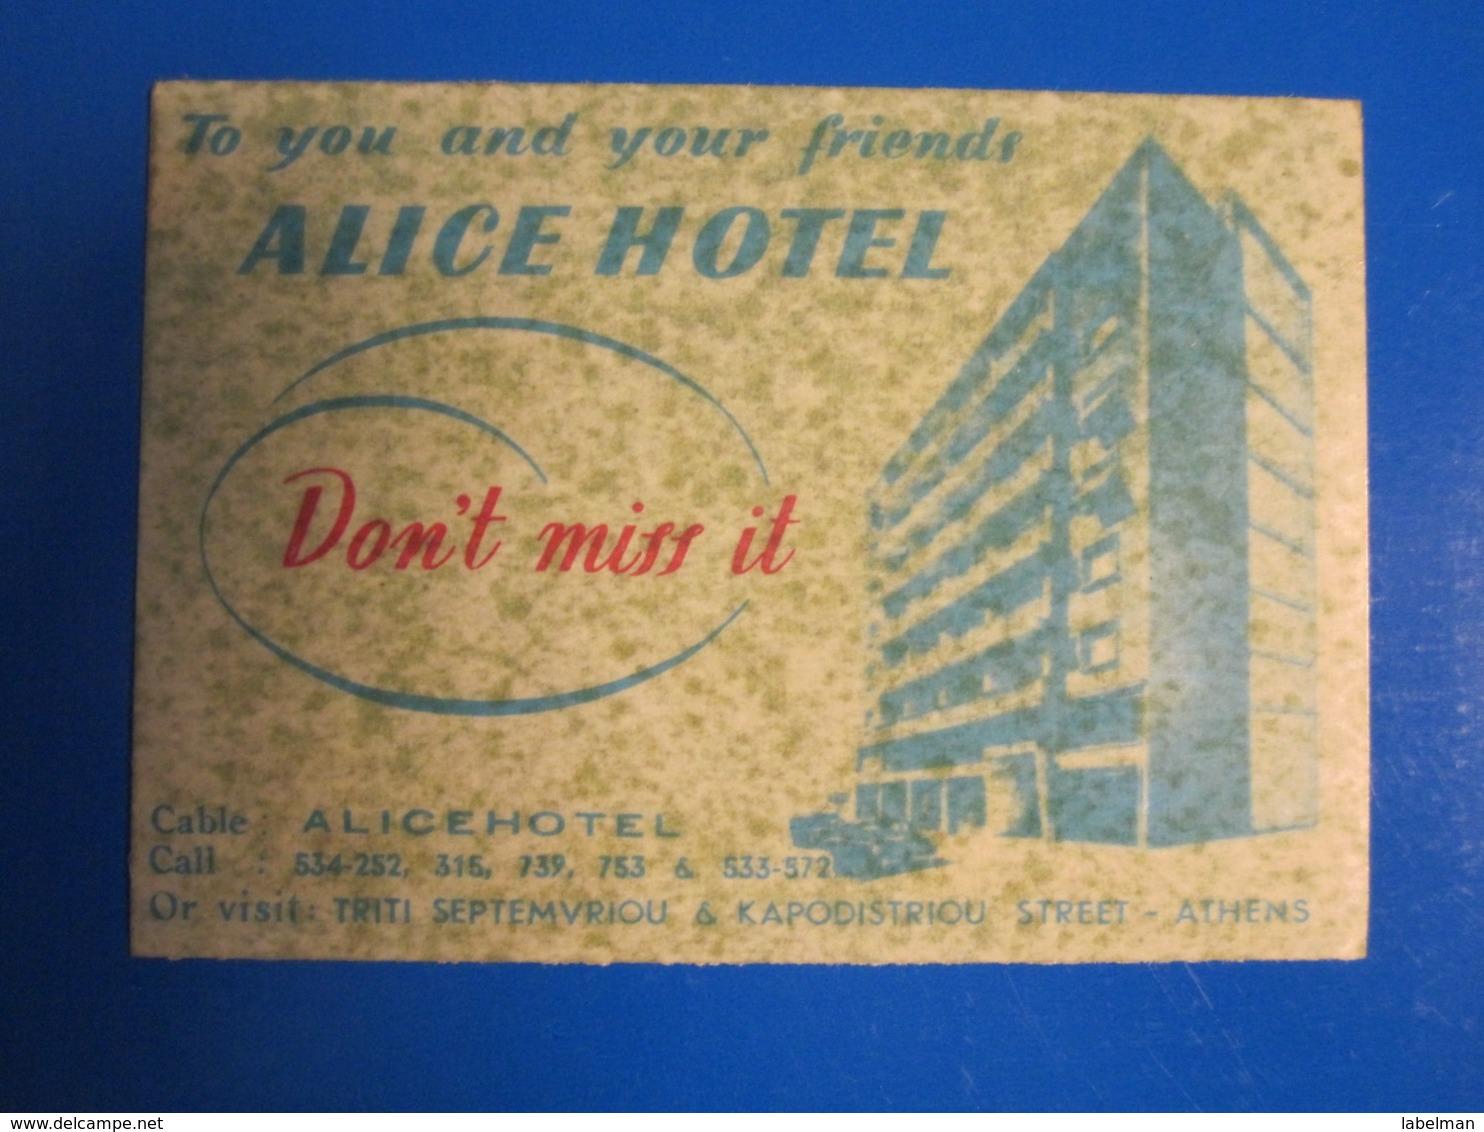 HOTEL MOTEL INN RESIDENCE ALICE ATHENS GREECE LUGGAGE LABEL ETIQUETTE AUFKLEBER DECAL STICKER - Etiketten Van Hotels